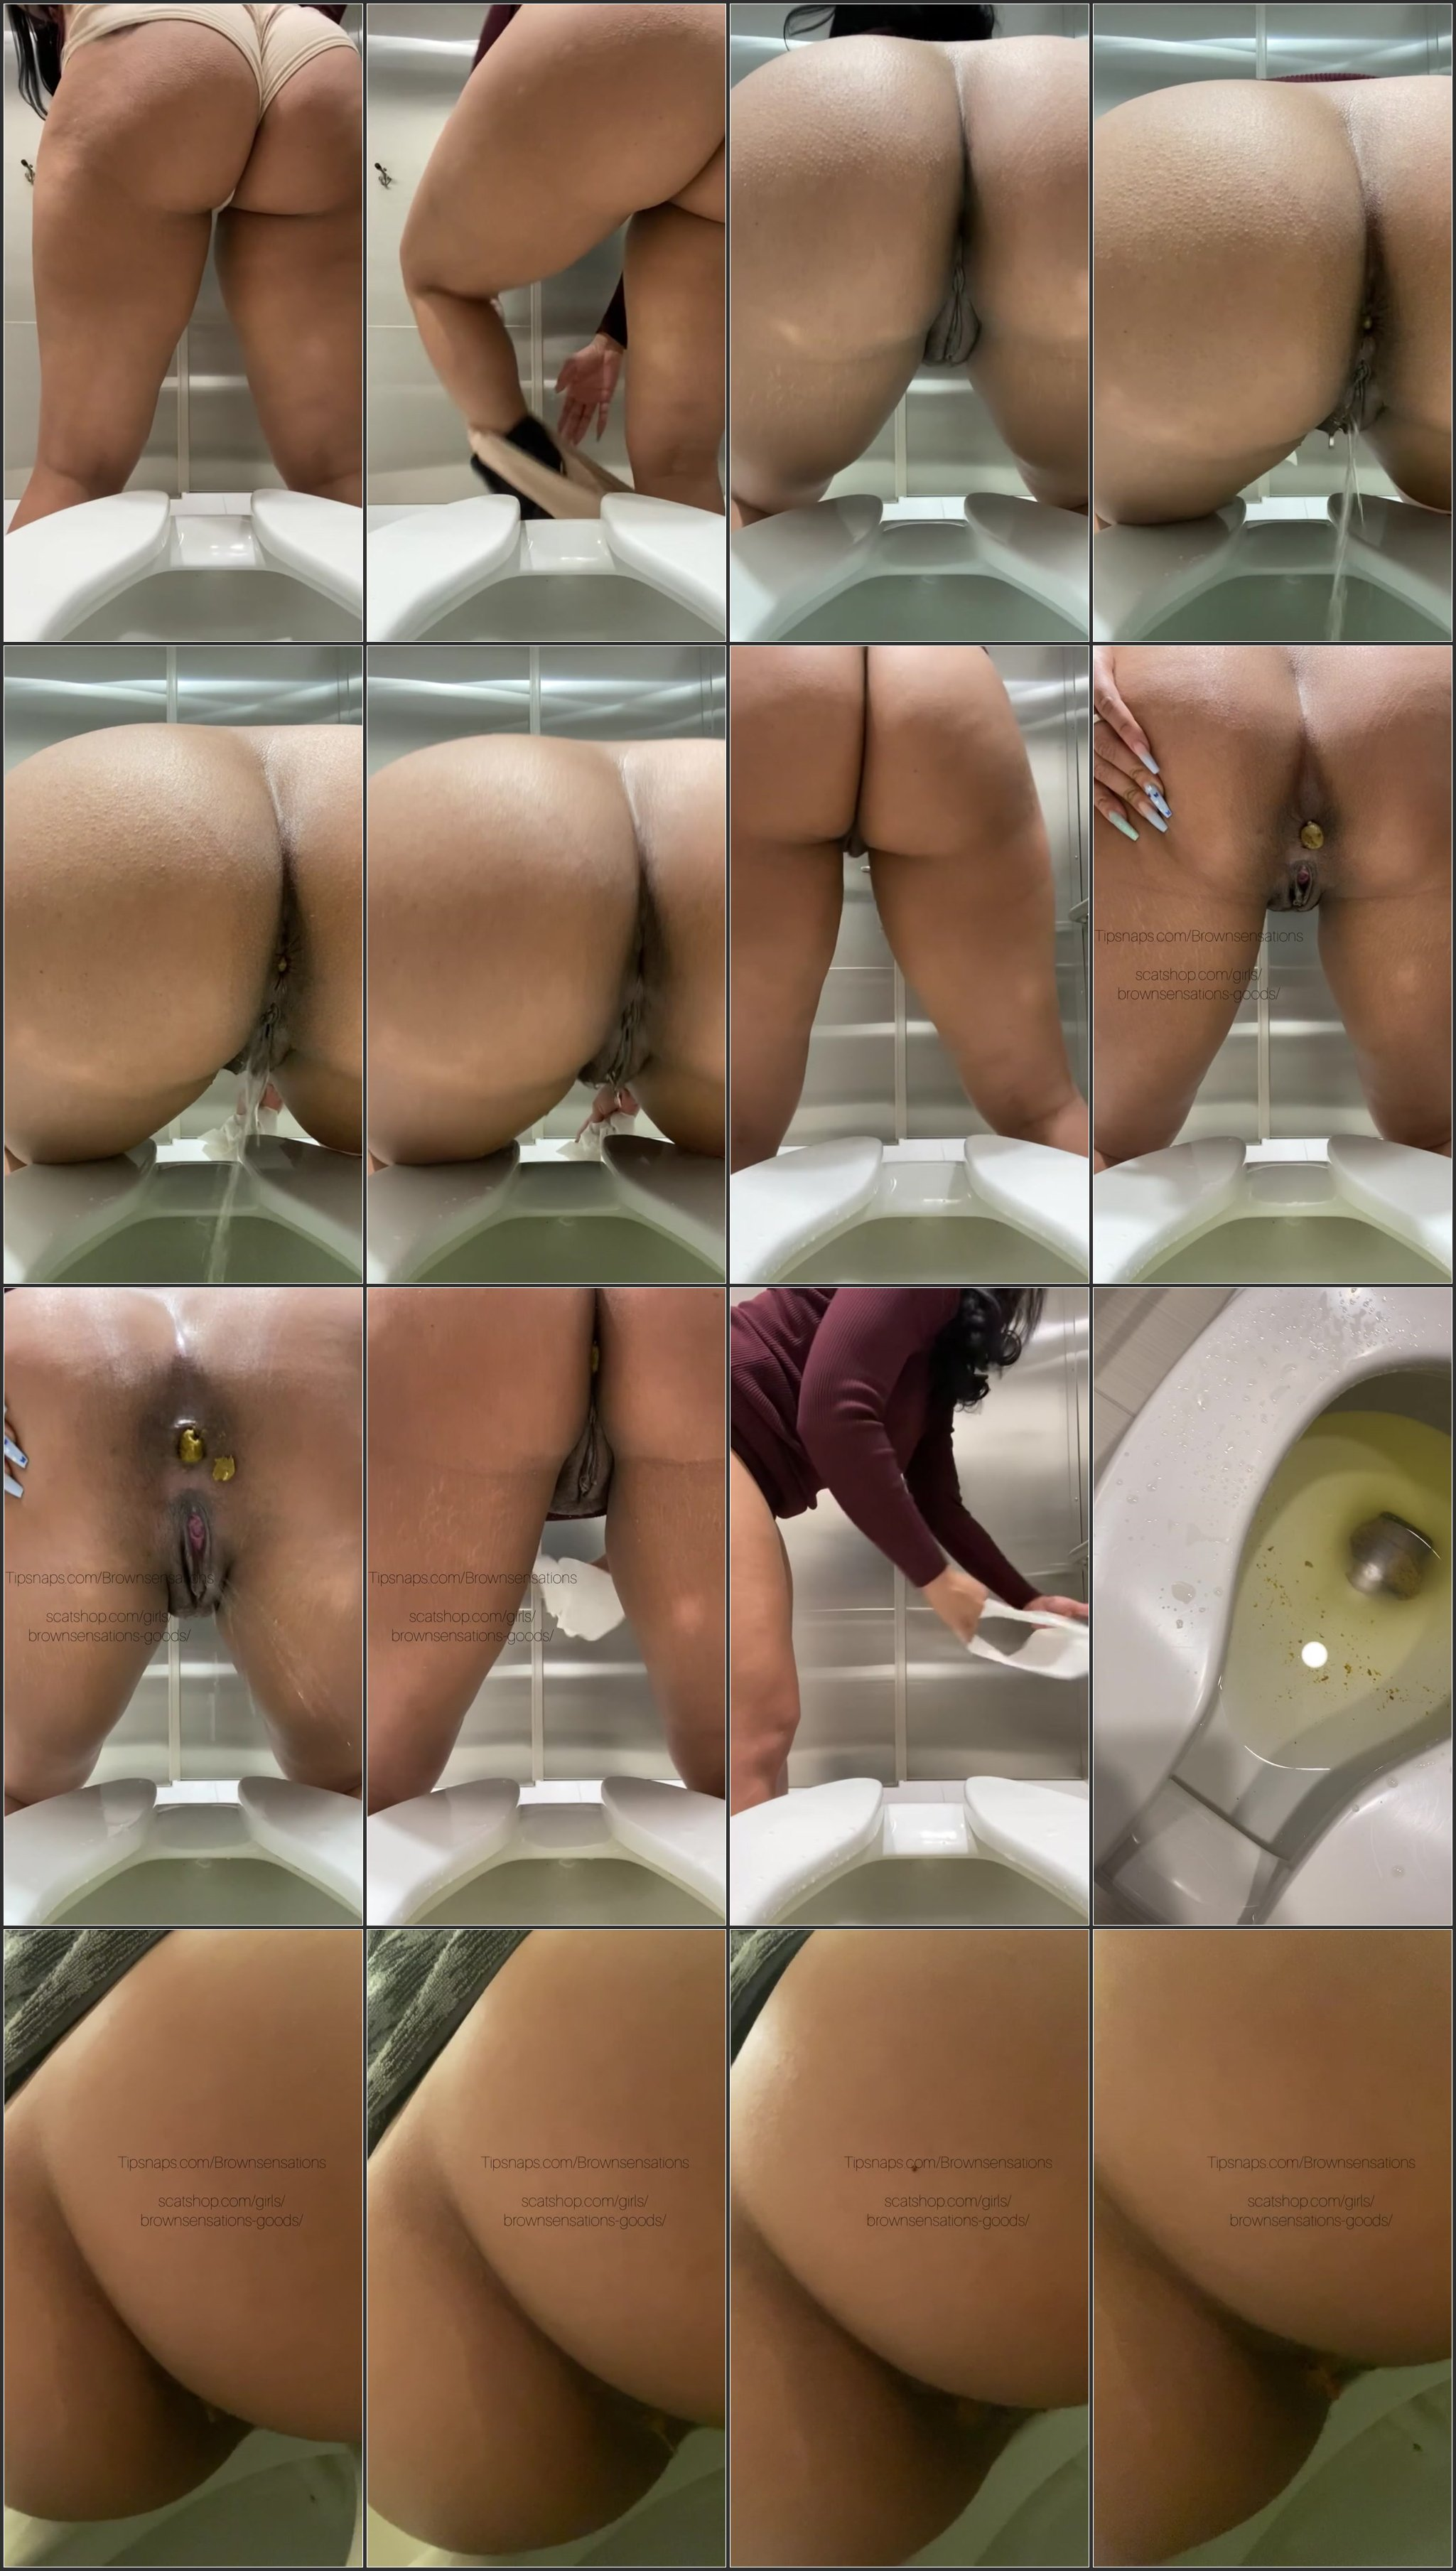 Brownsensations - Work and Home Shit.ScrinList